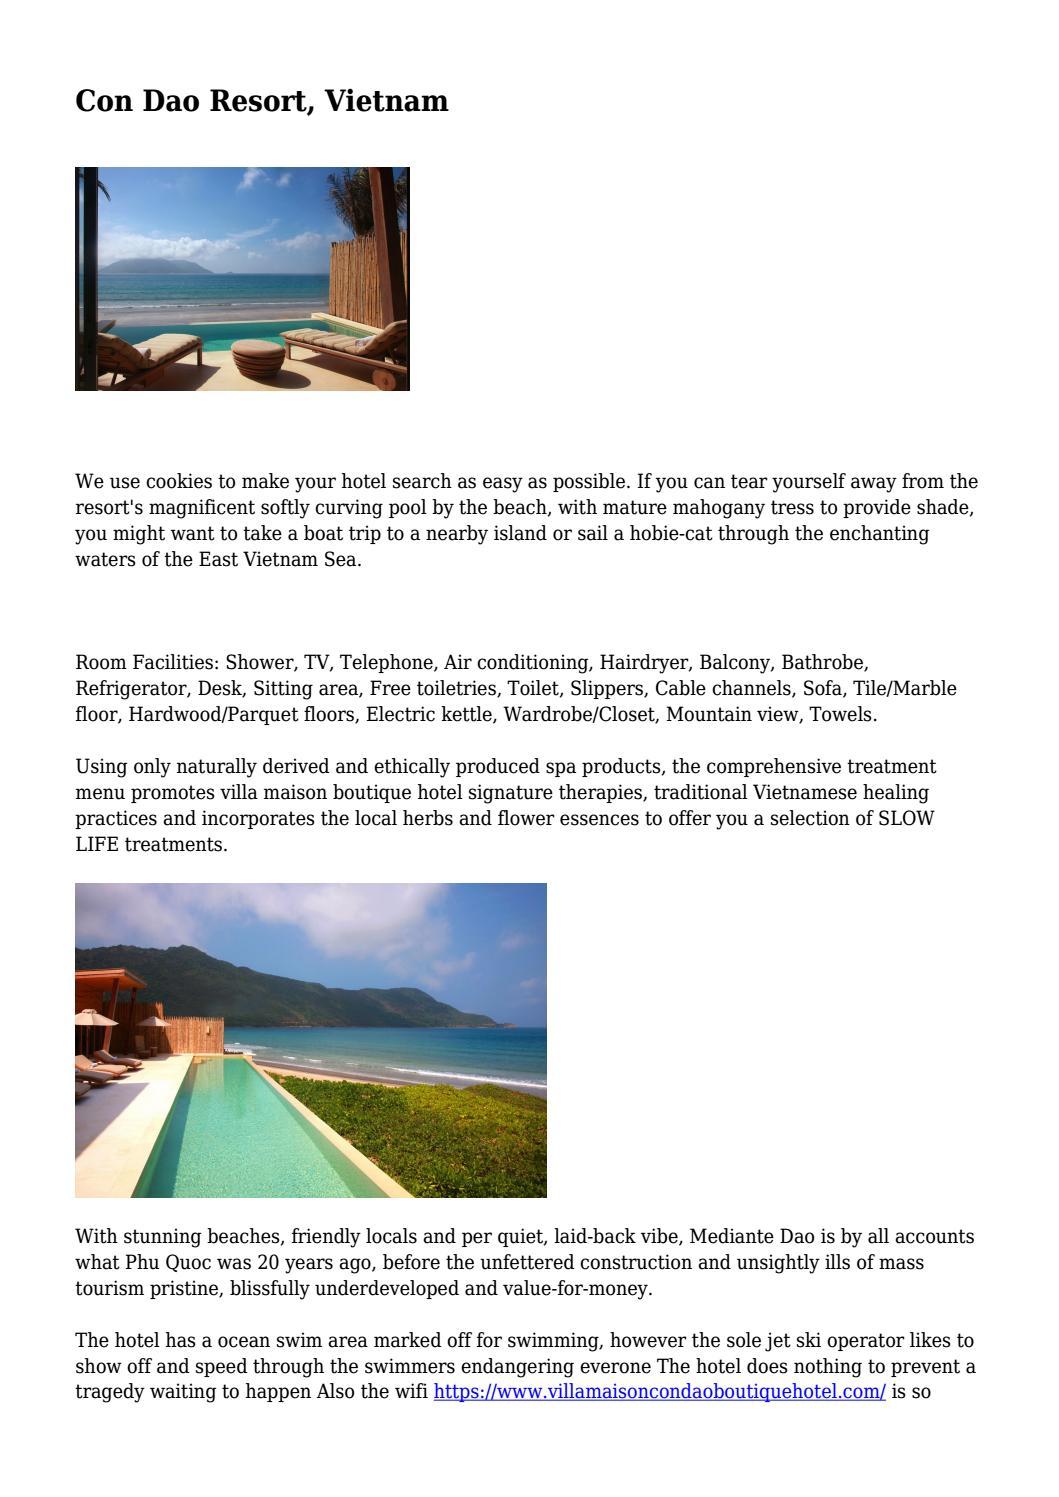 Con Dao Resort, Vietnam    by bushagarvloorj - issuu